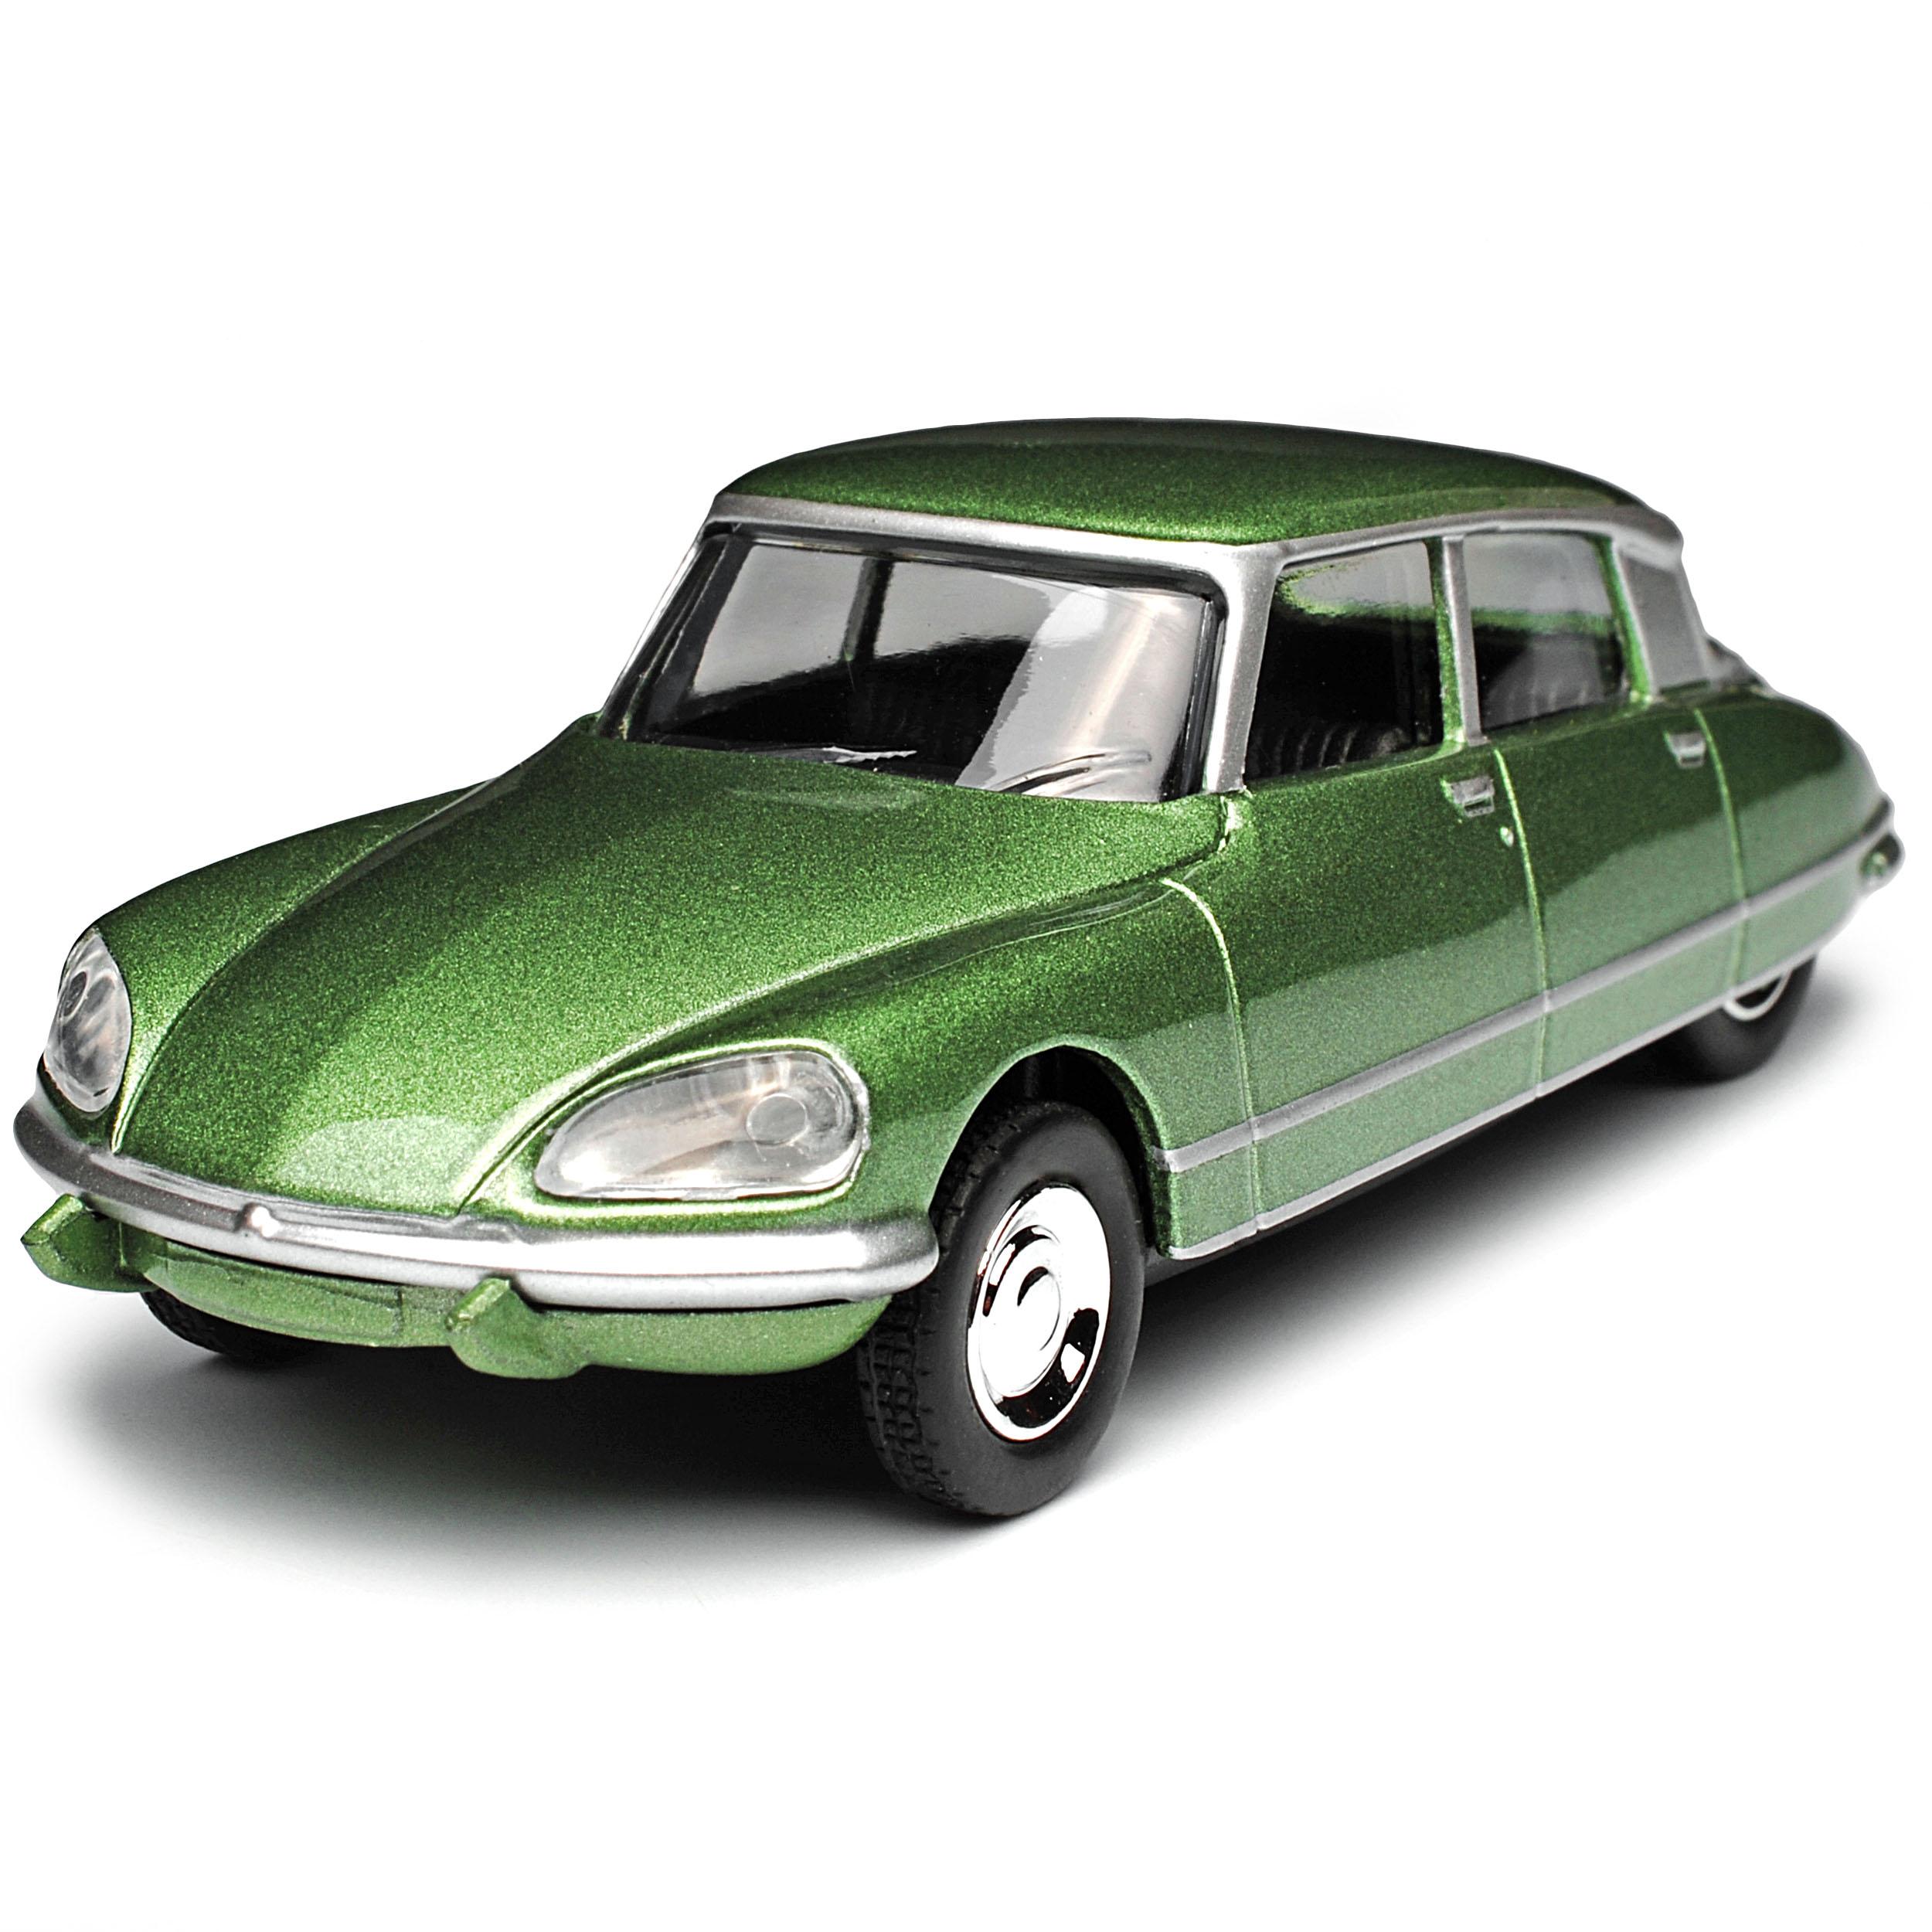 citroen ds23 limousine pallas gr n 1972 1975 1 64 norev. Black Bedroom Furniture Sets. Home Design Ideas